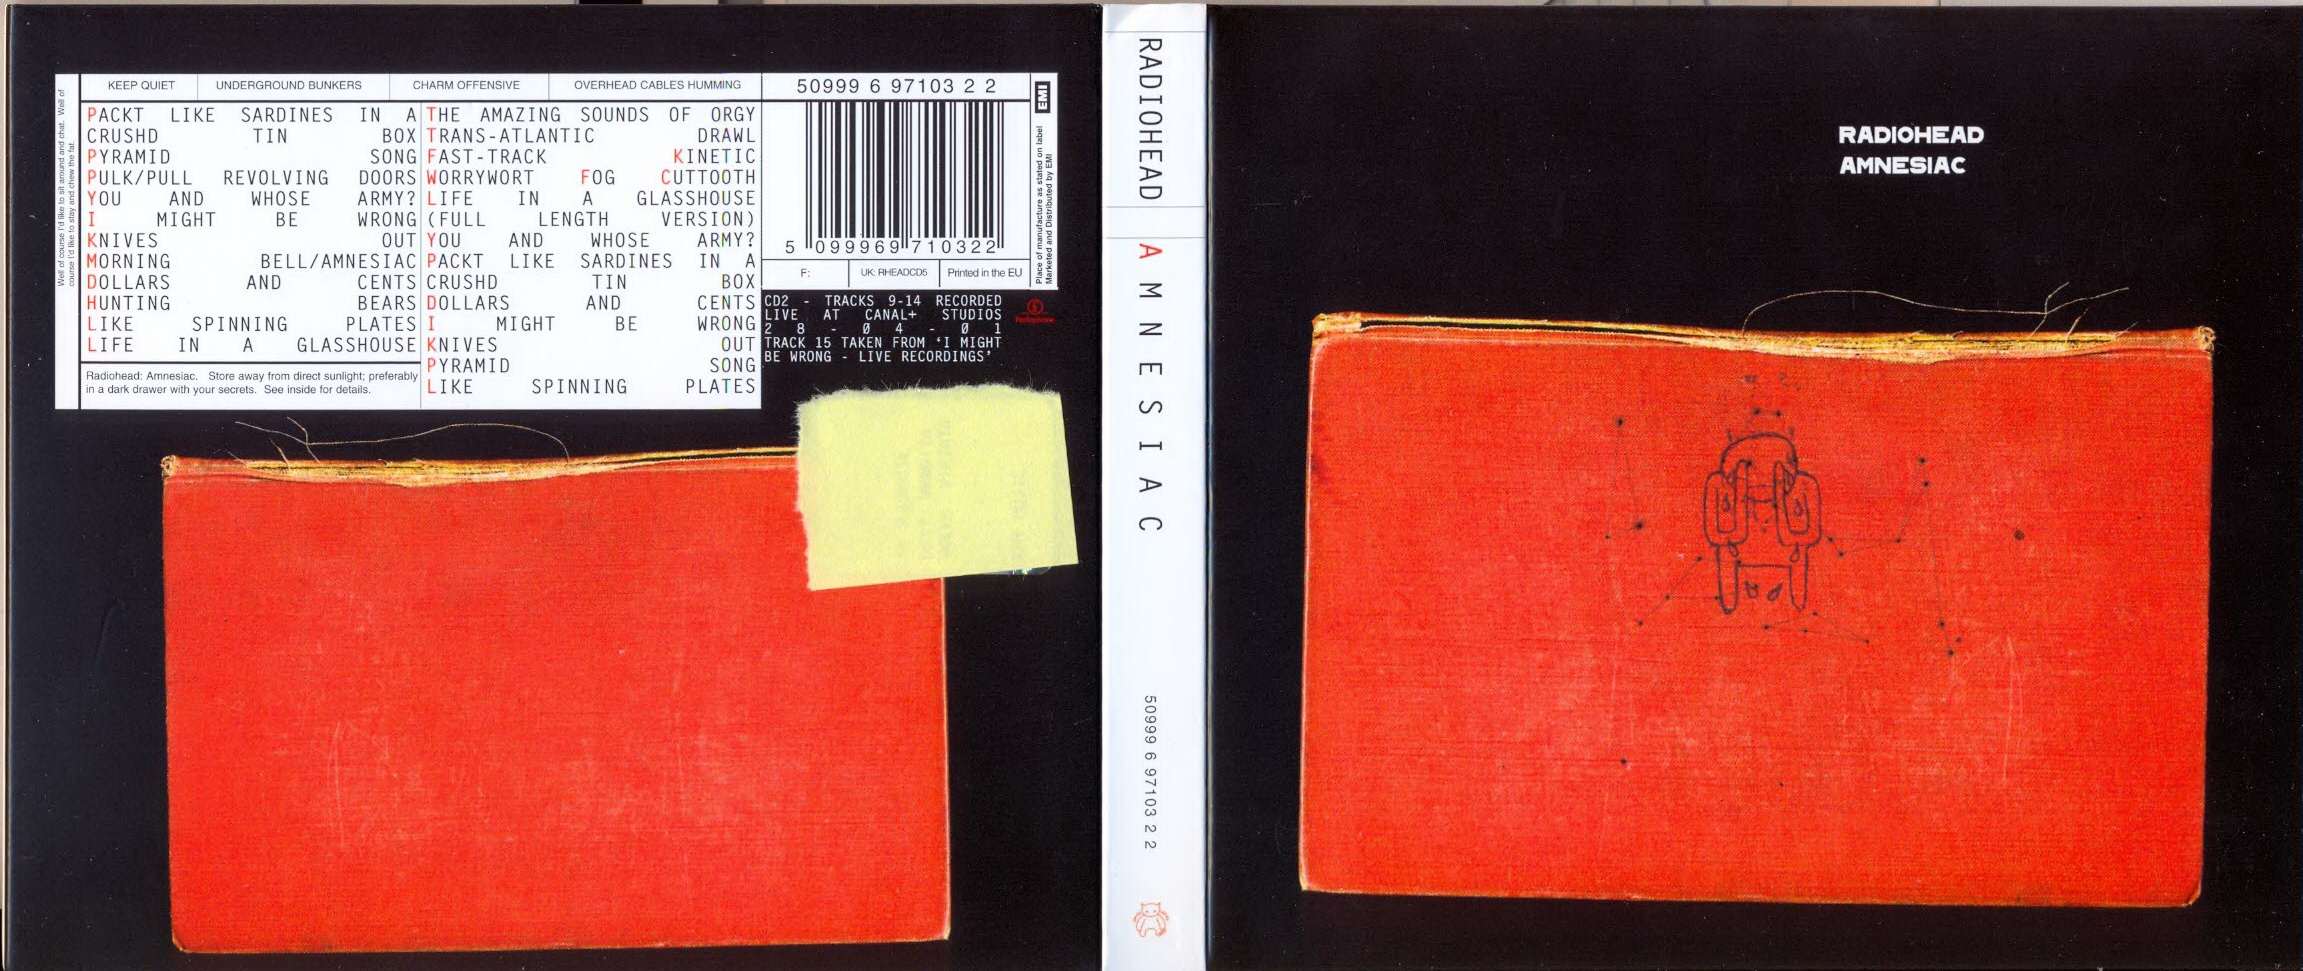 Radiohead-Amnesiac_(Collectors_Edition)-2CD-2009-ONe ...